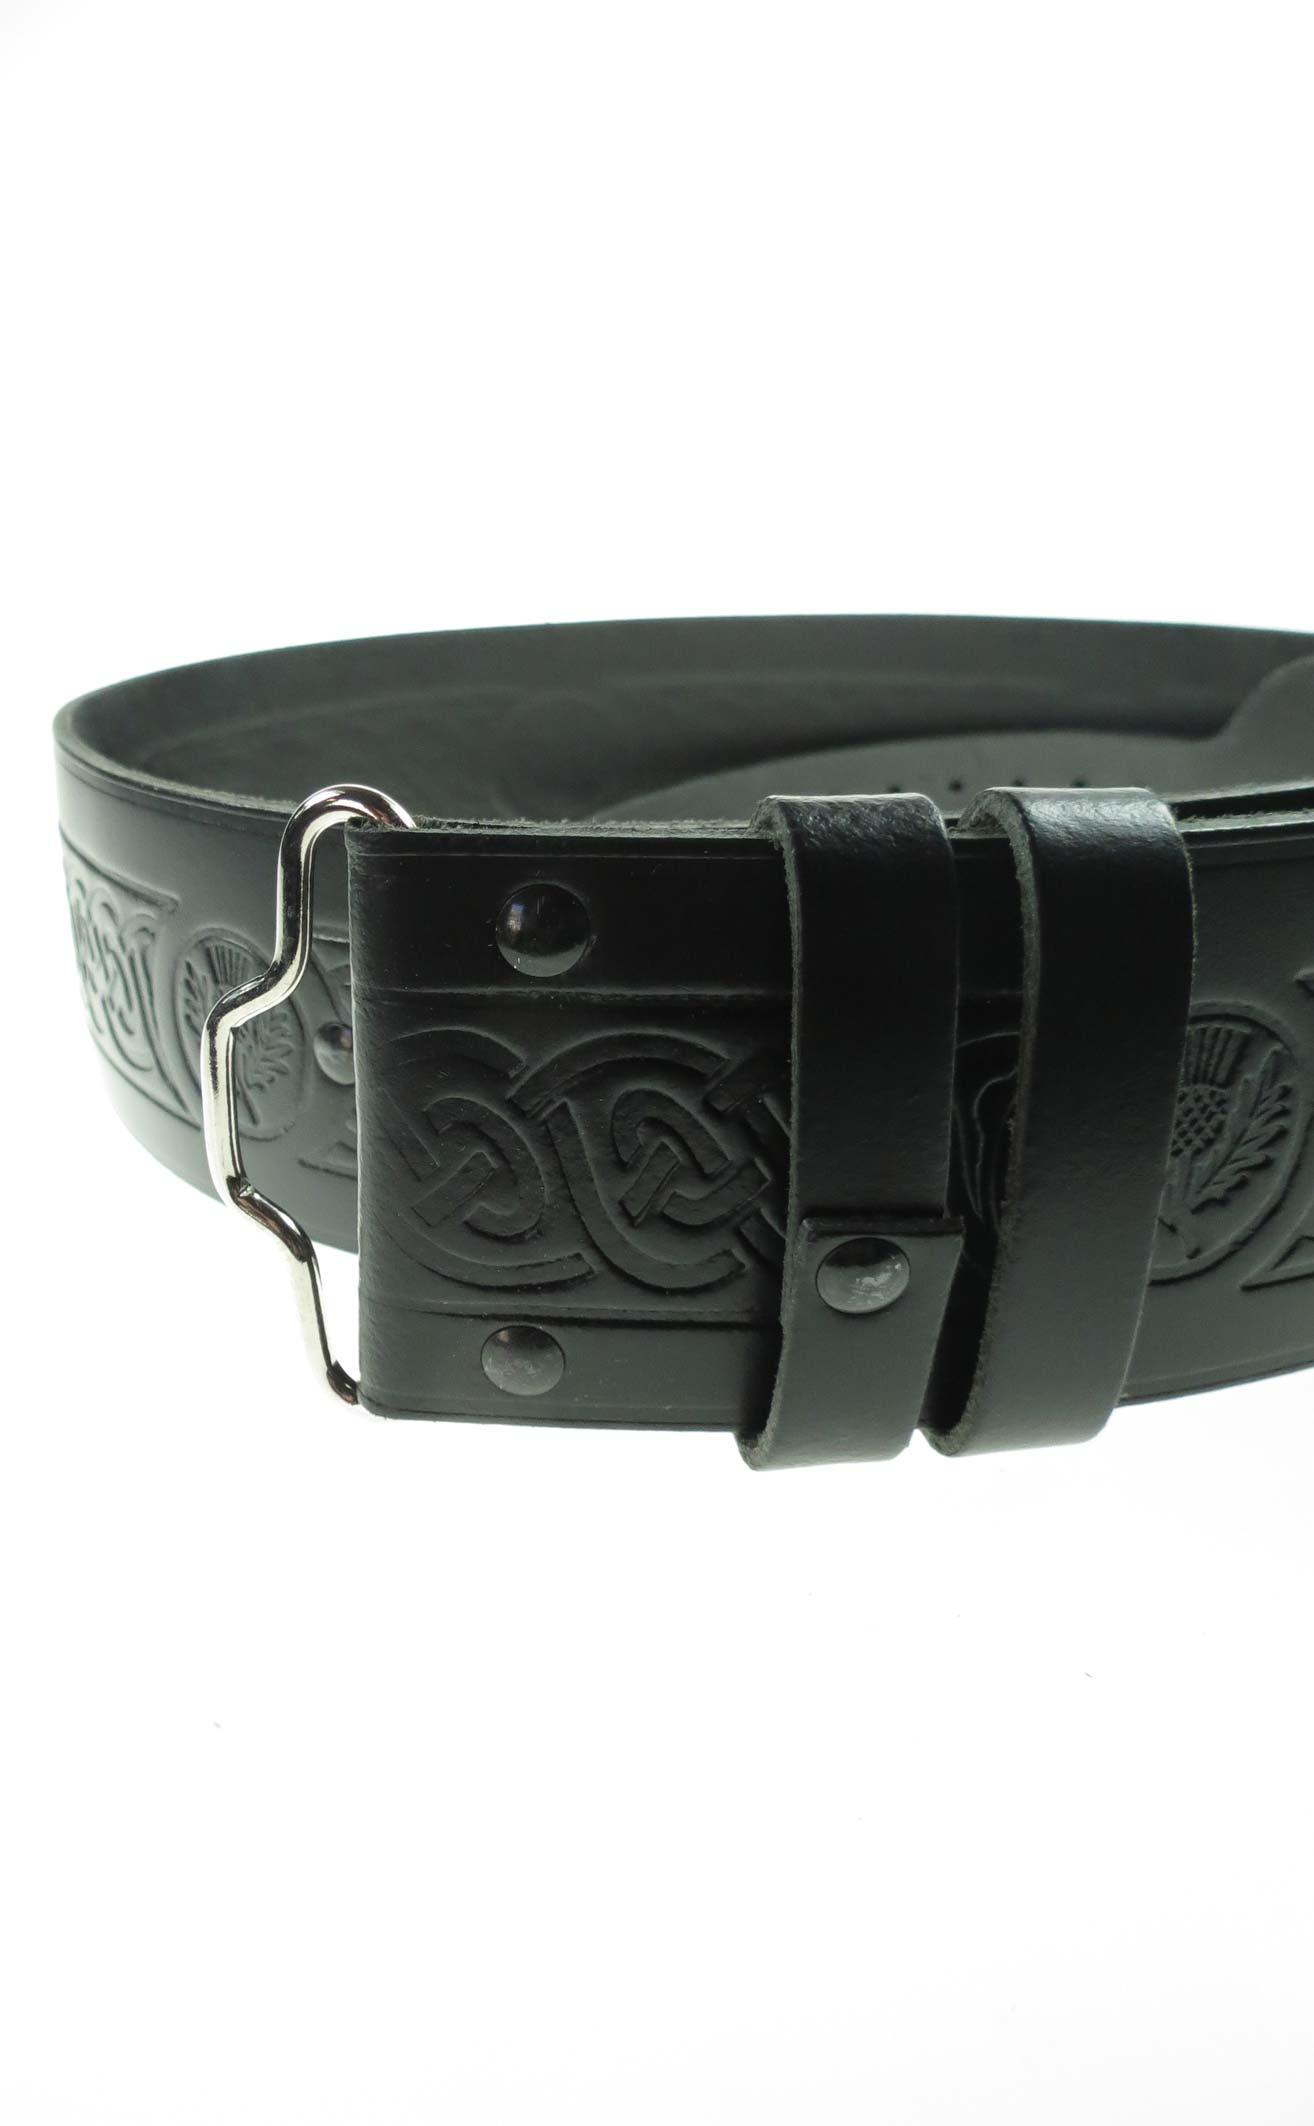 Ladies belt buckles uk